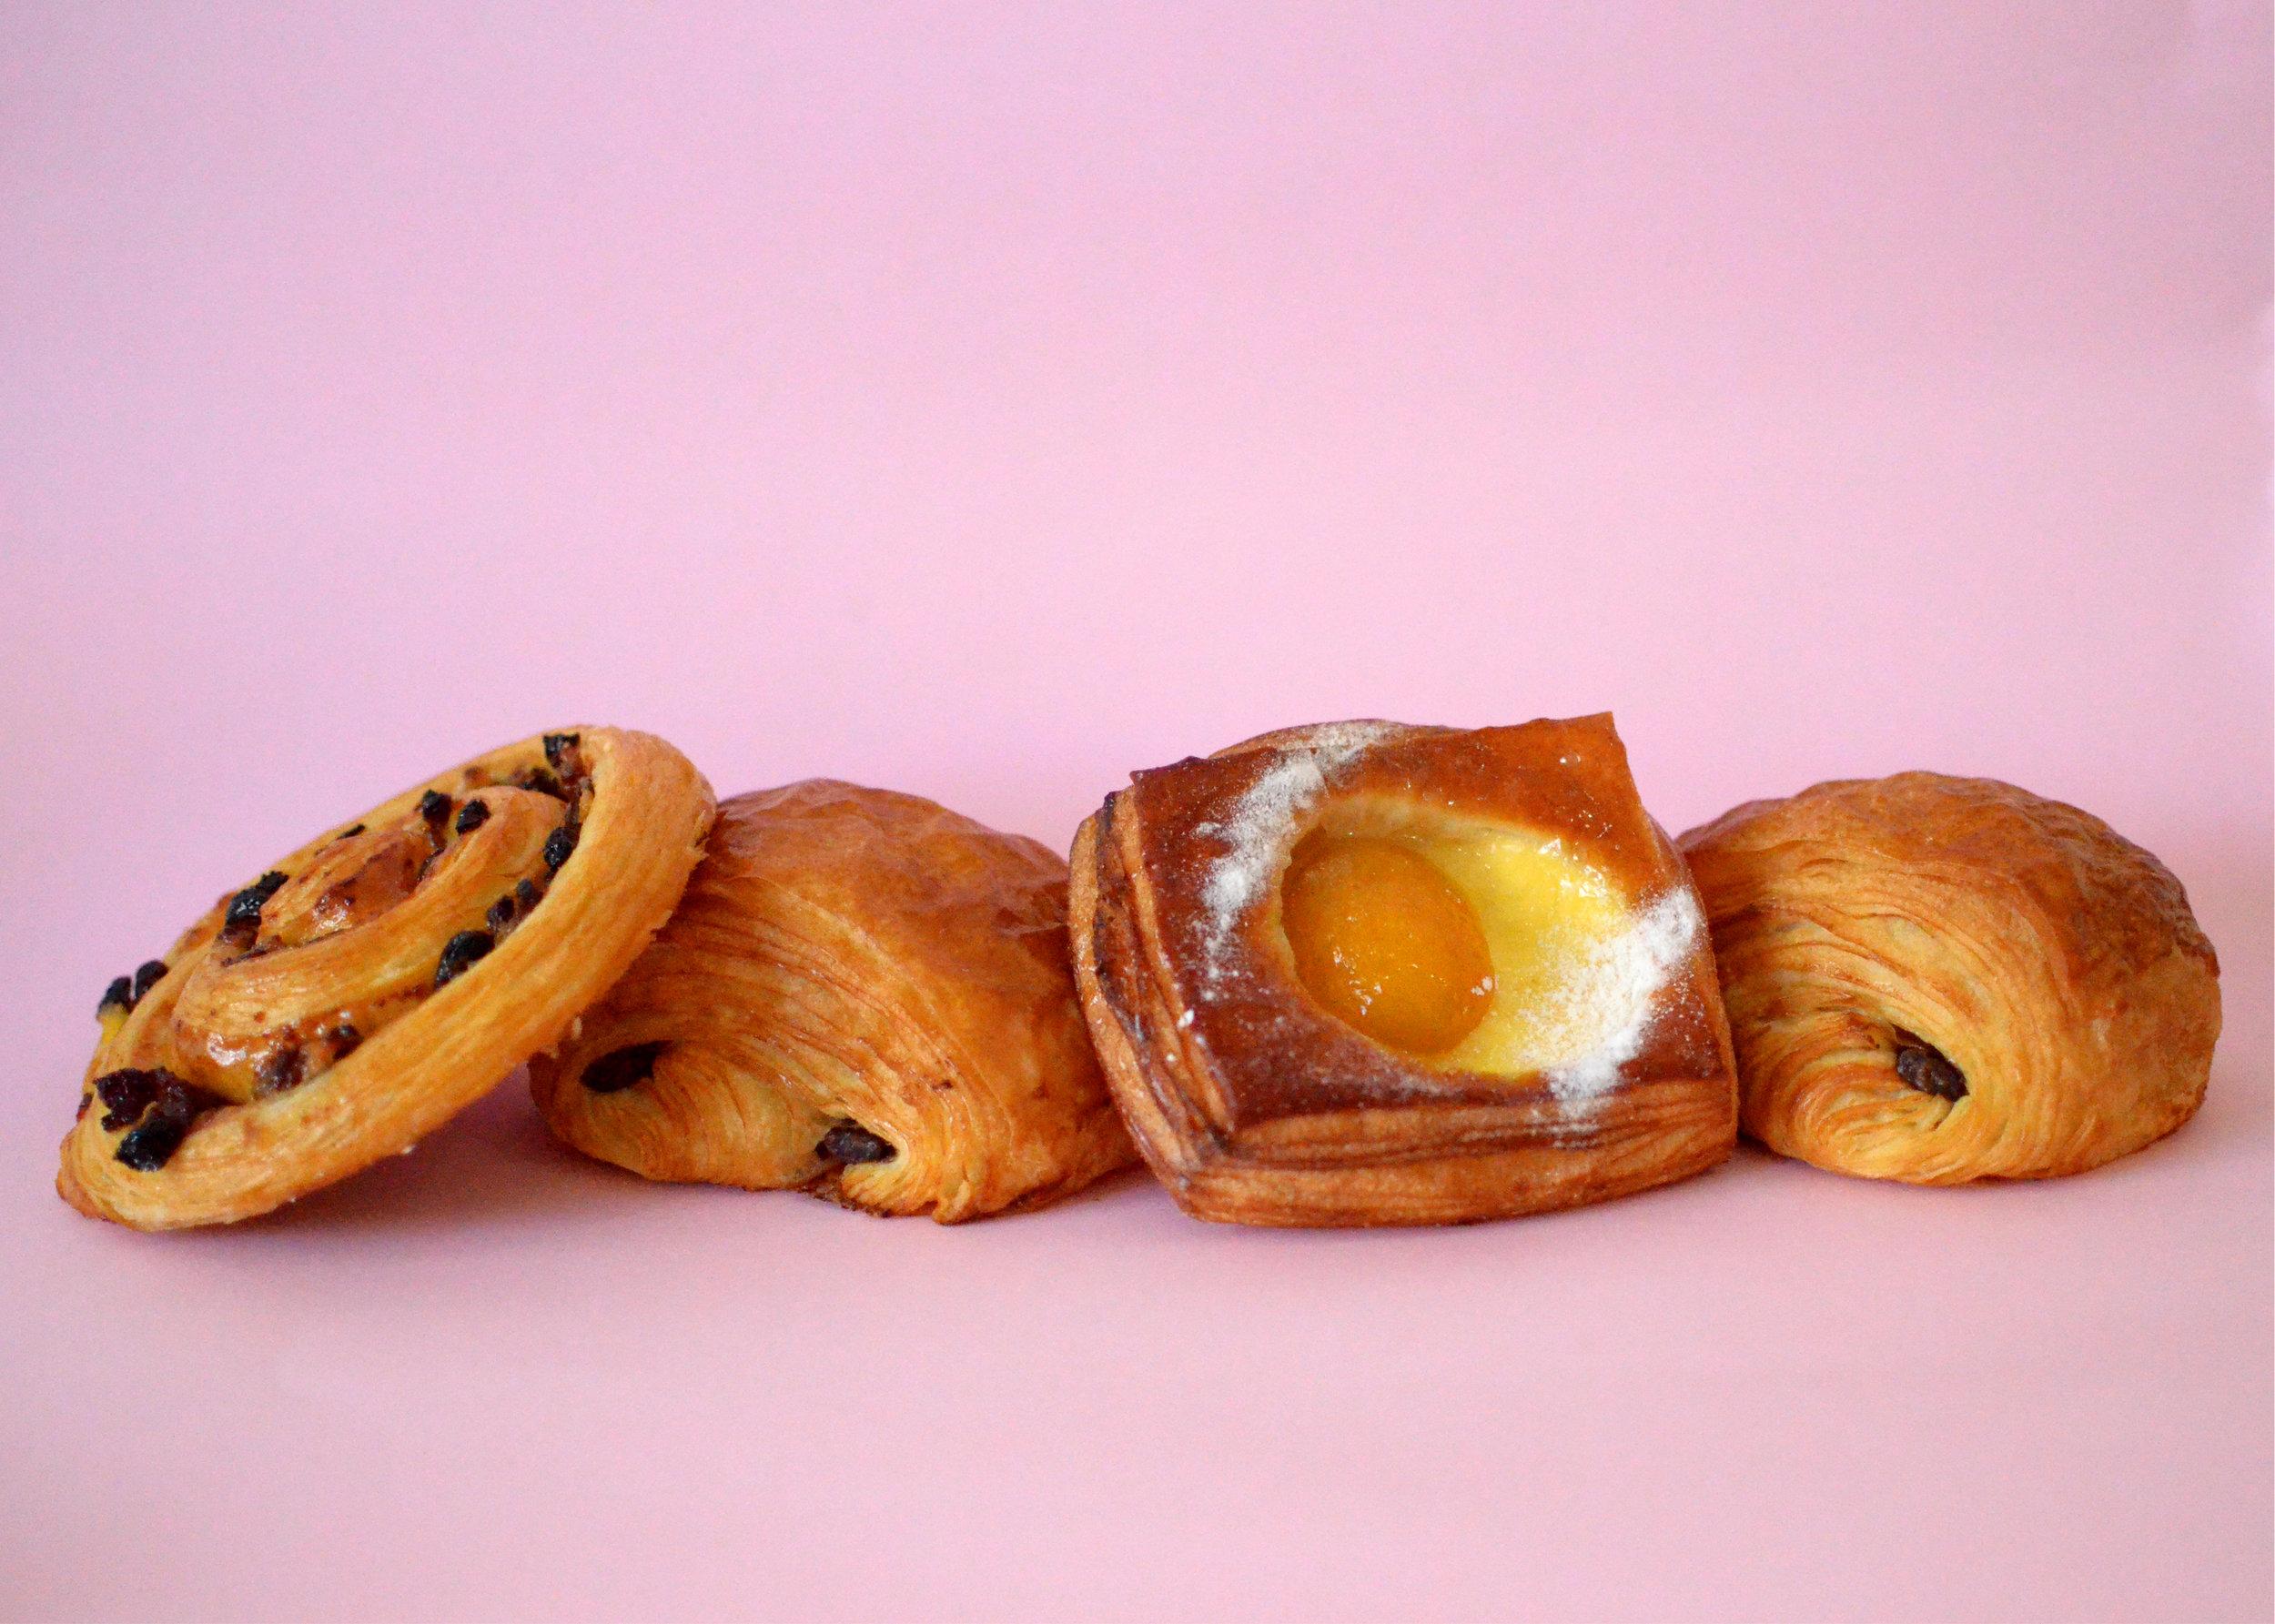 PastriesSML.jpg